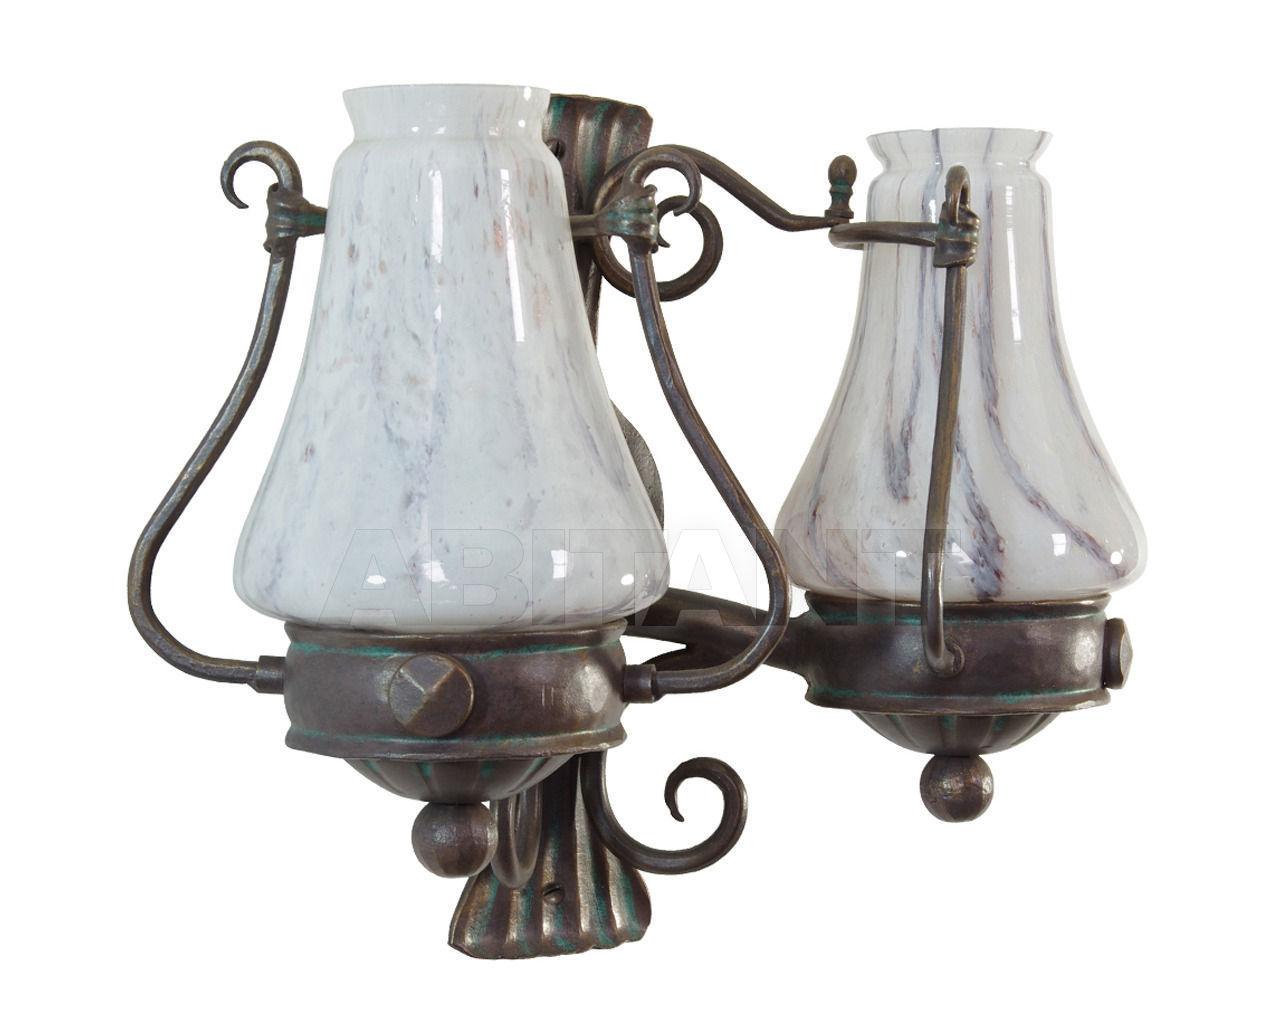 Купить Светильник настенный FMB Leuchten Schmiedeeisen Lampen Und Leuchten 94083